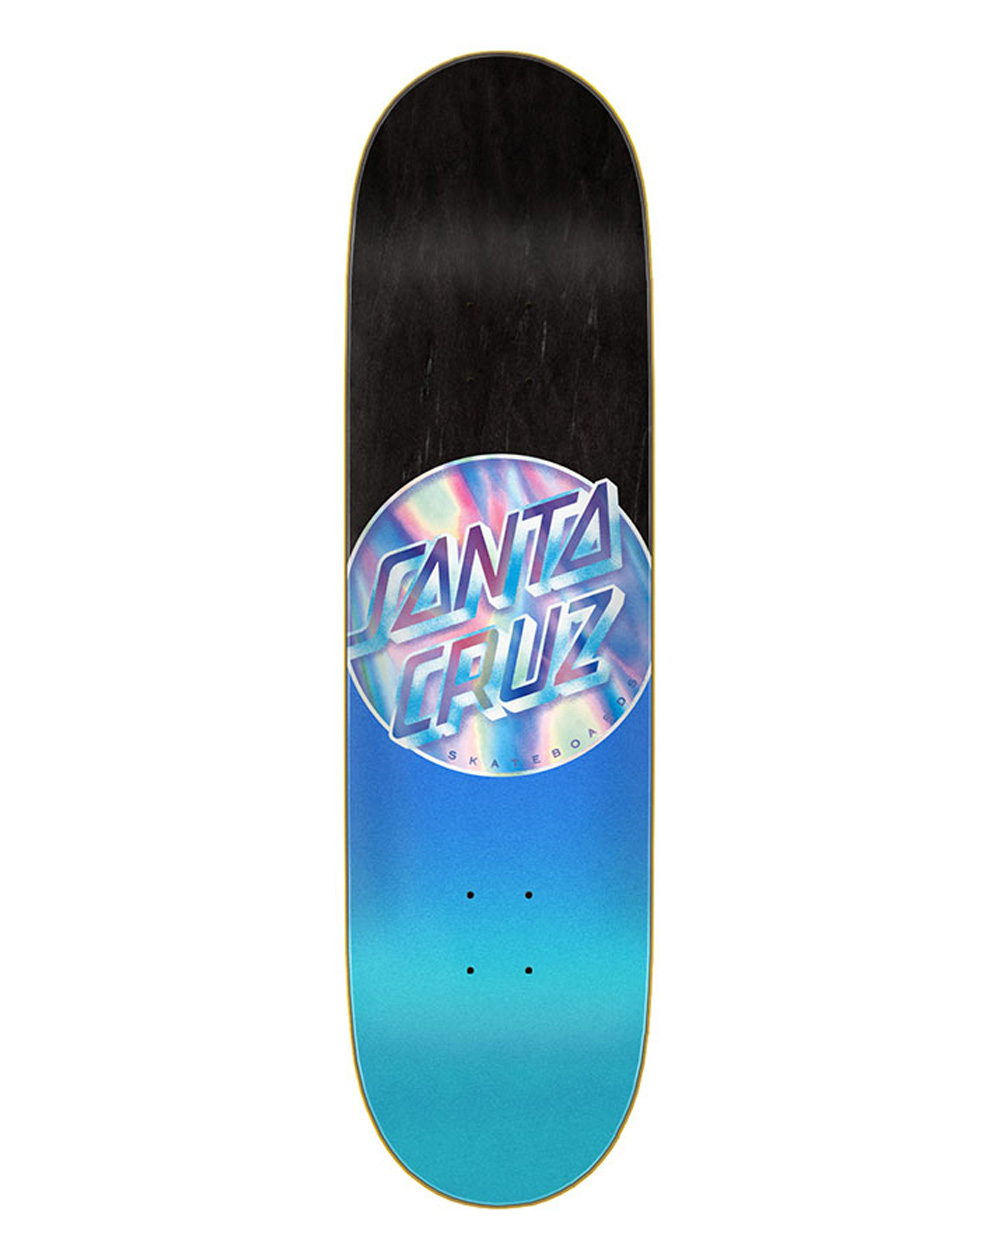 "Santa Cruz Iridescent Dot 8.5"" Skateboard Deck"